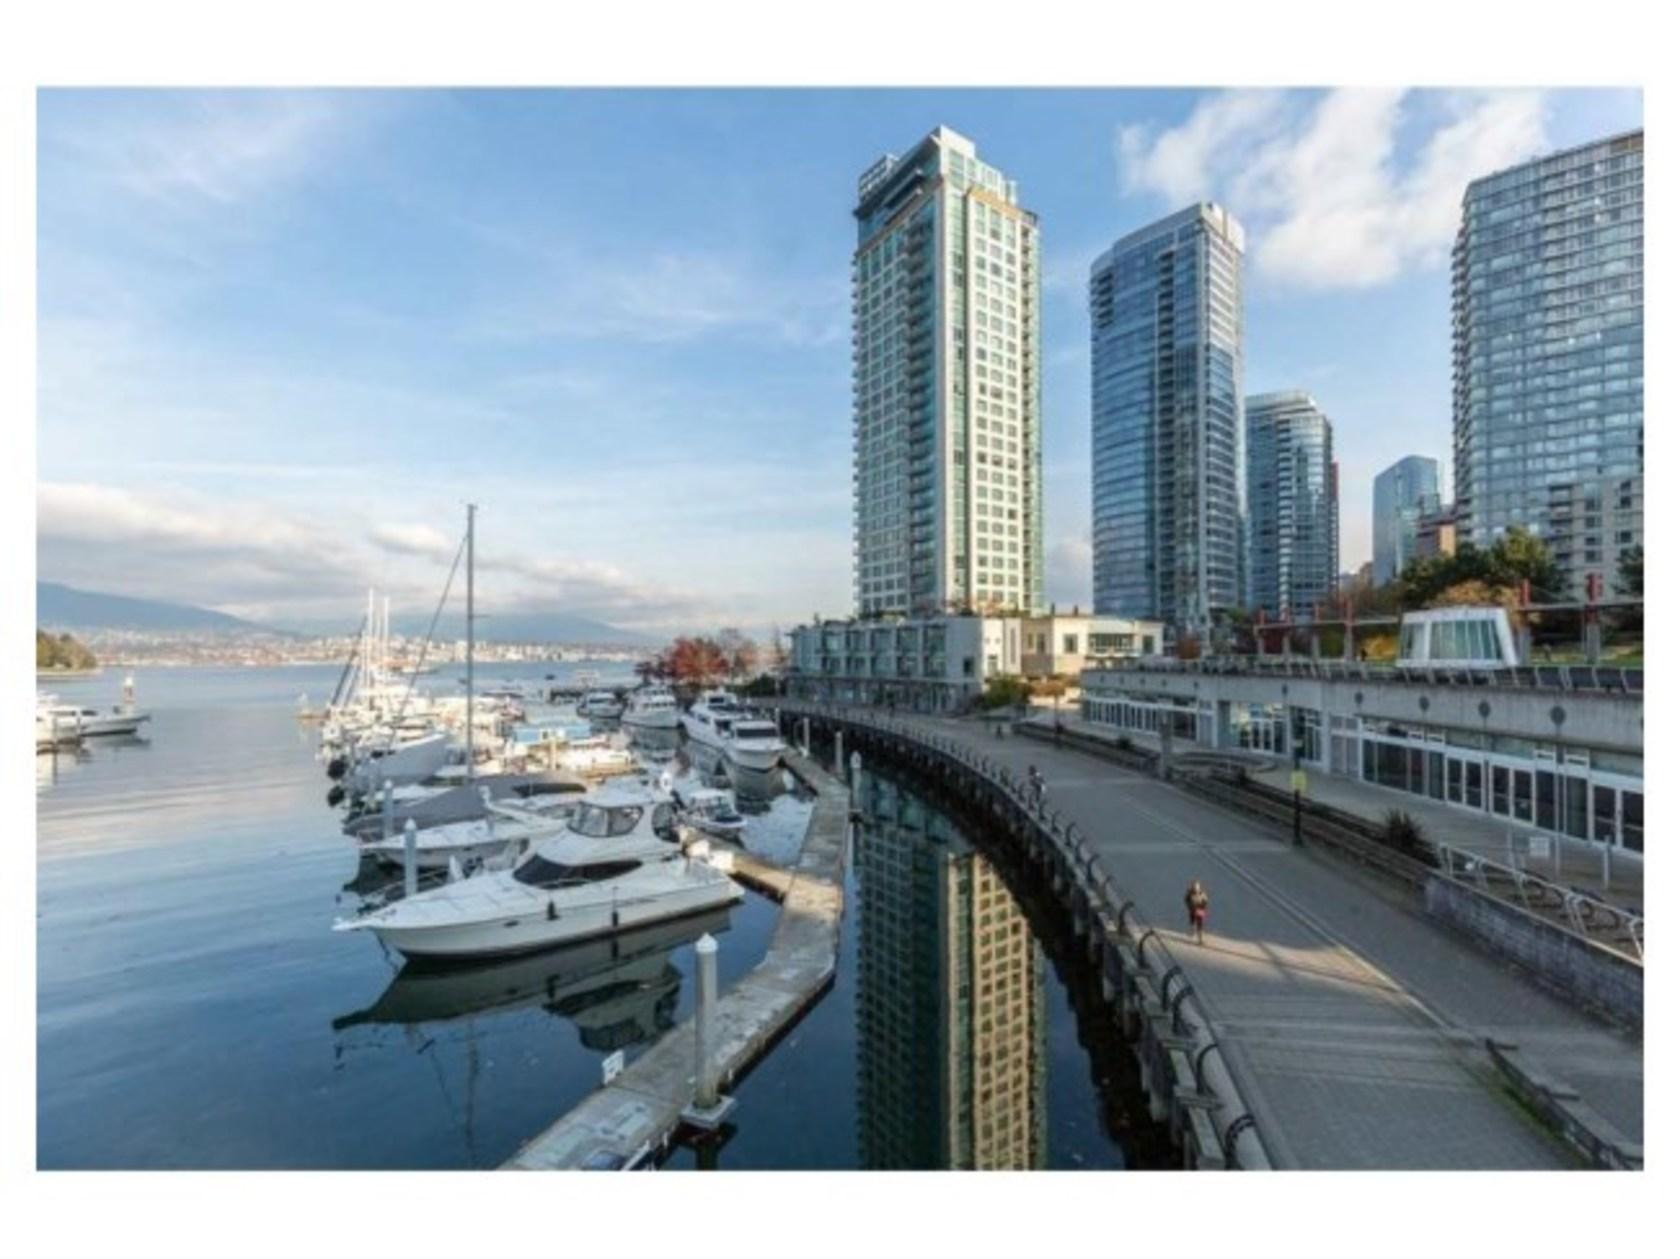 36bec2ca9c49d84a3280d4ff78612495 at 2102 - 323 Jervis Street, Coal Harbour, Vancouver West